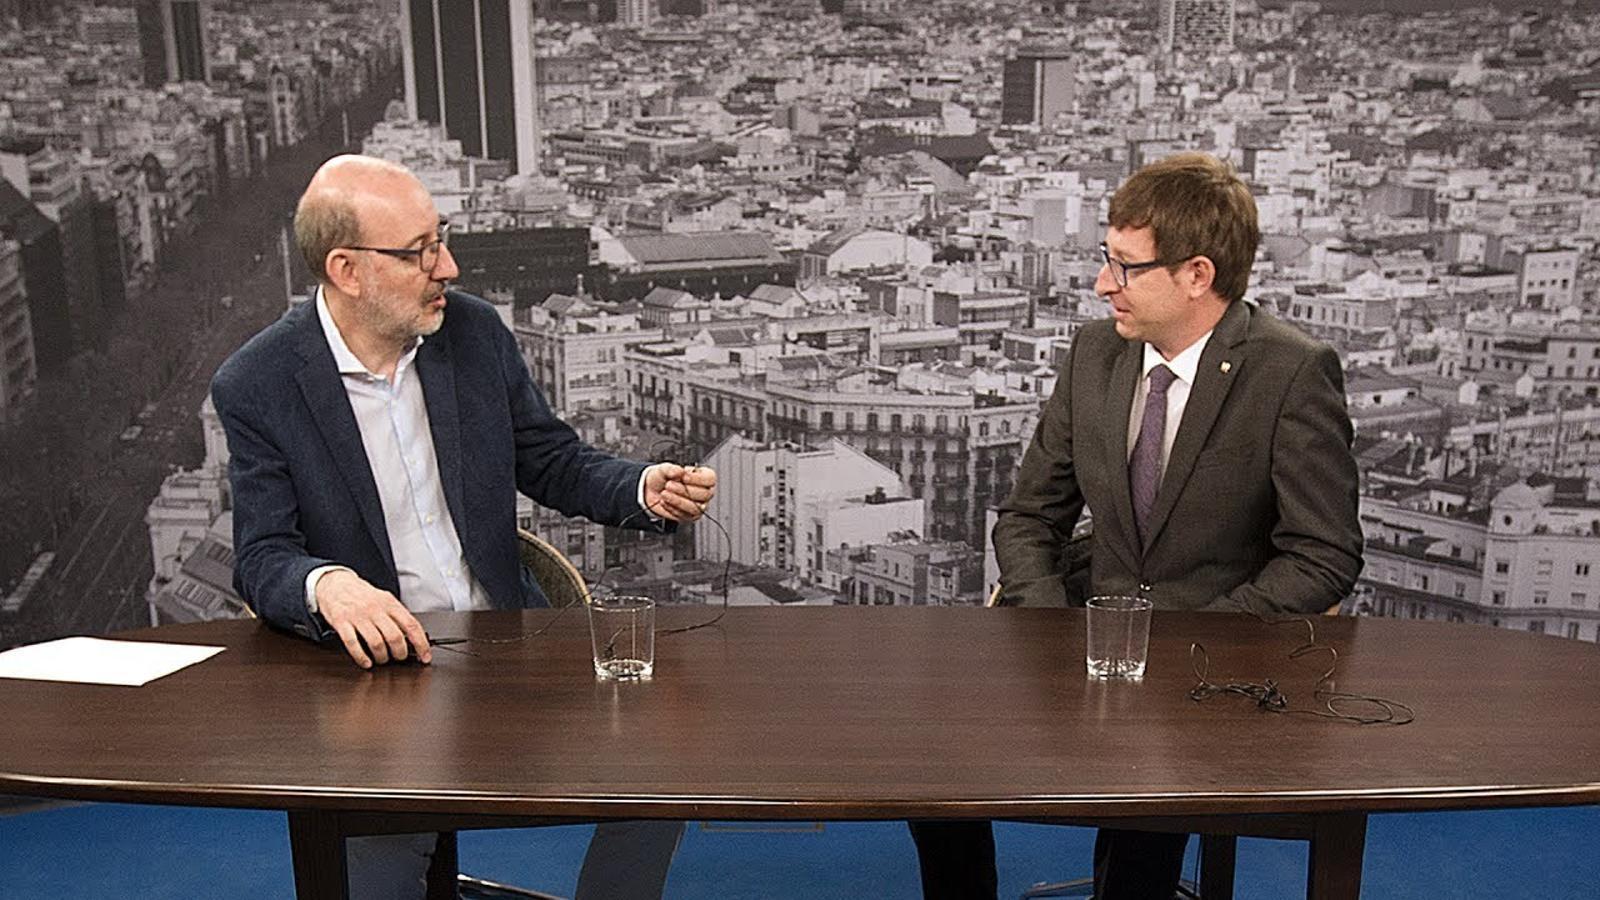 Entrevista d'Antoni Bassas a Carles Mundó